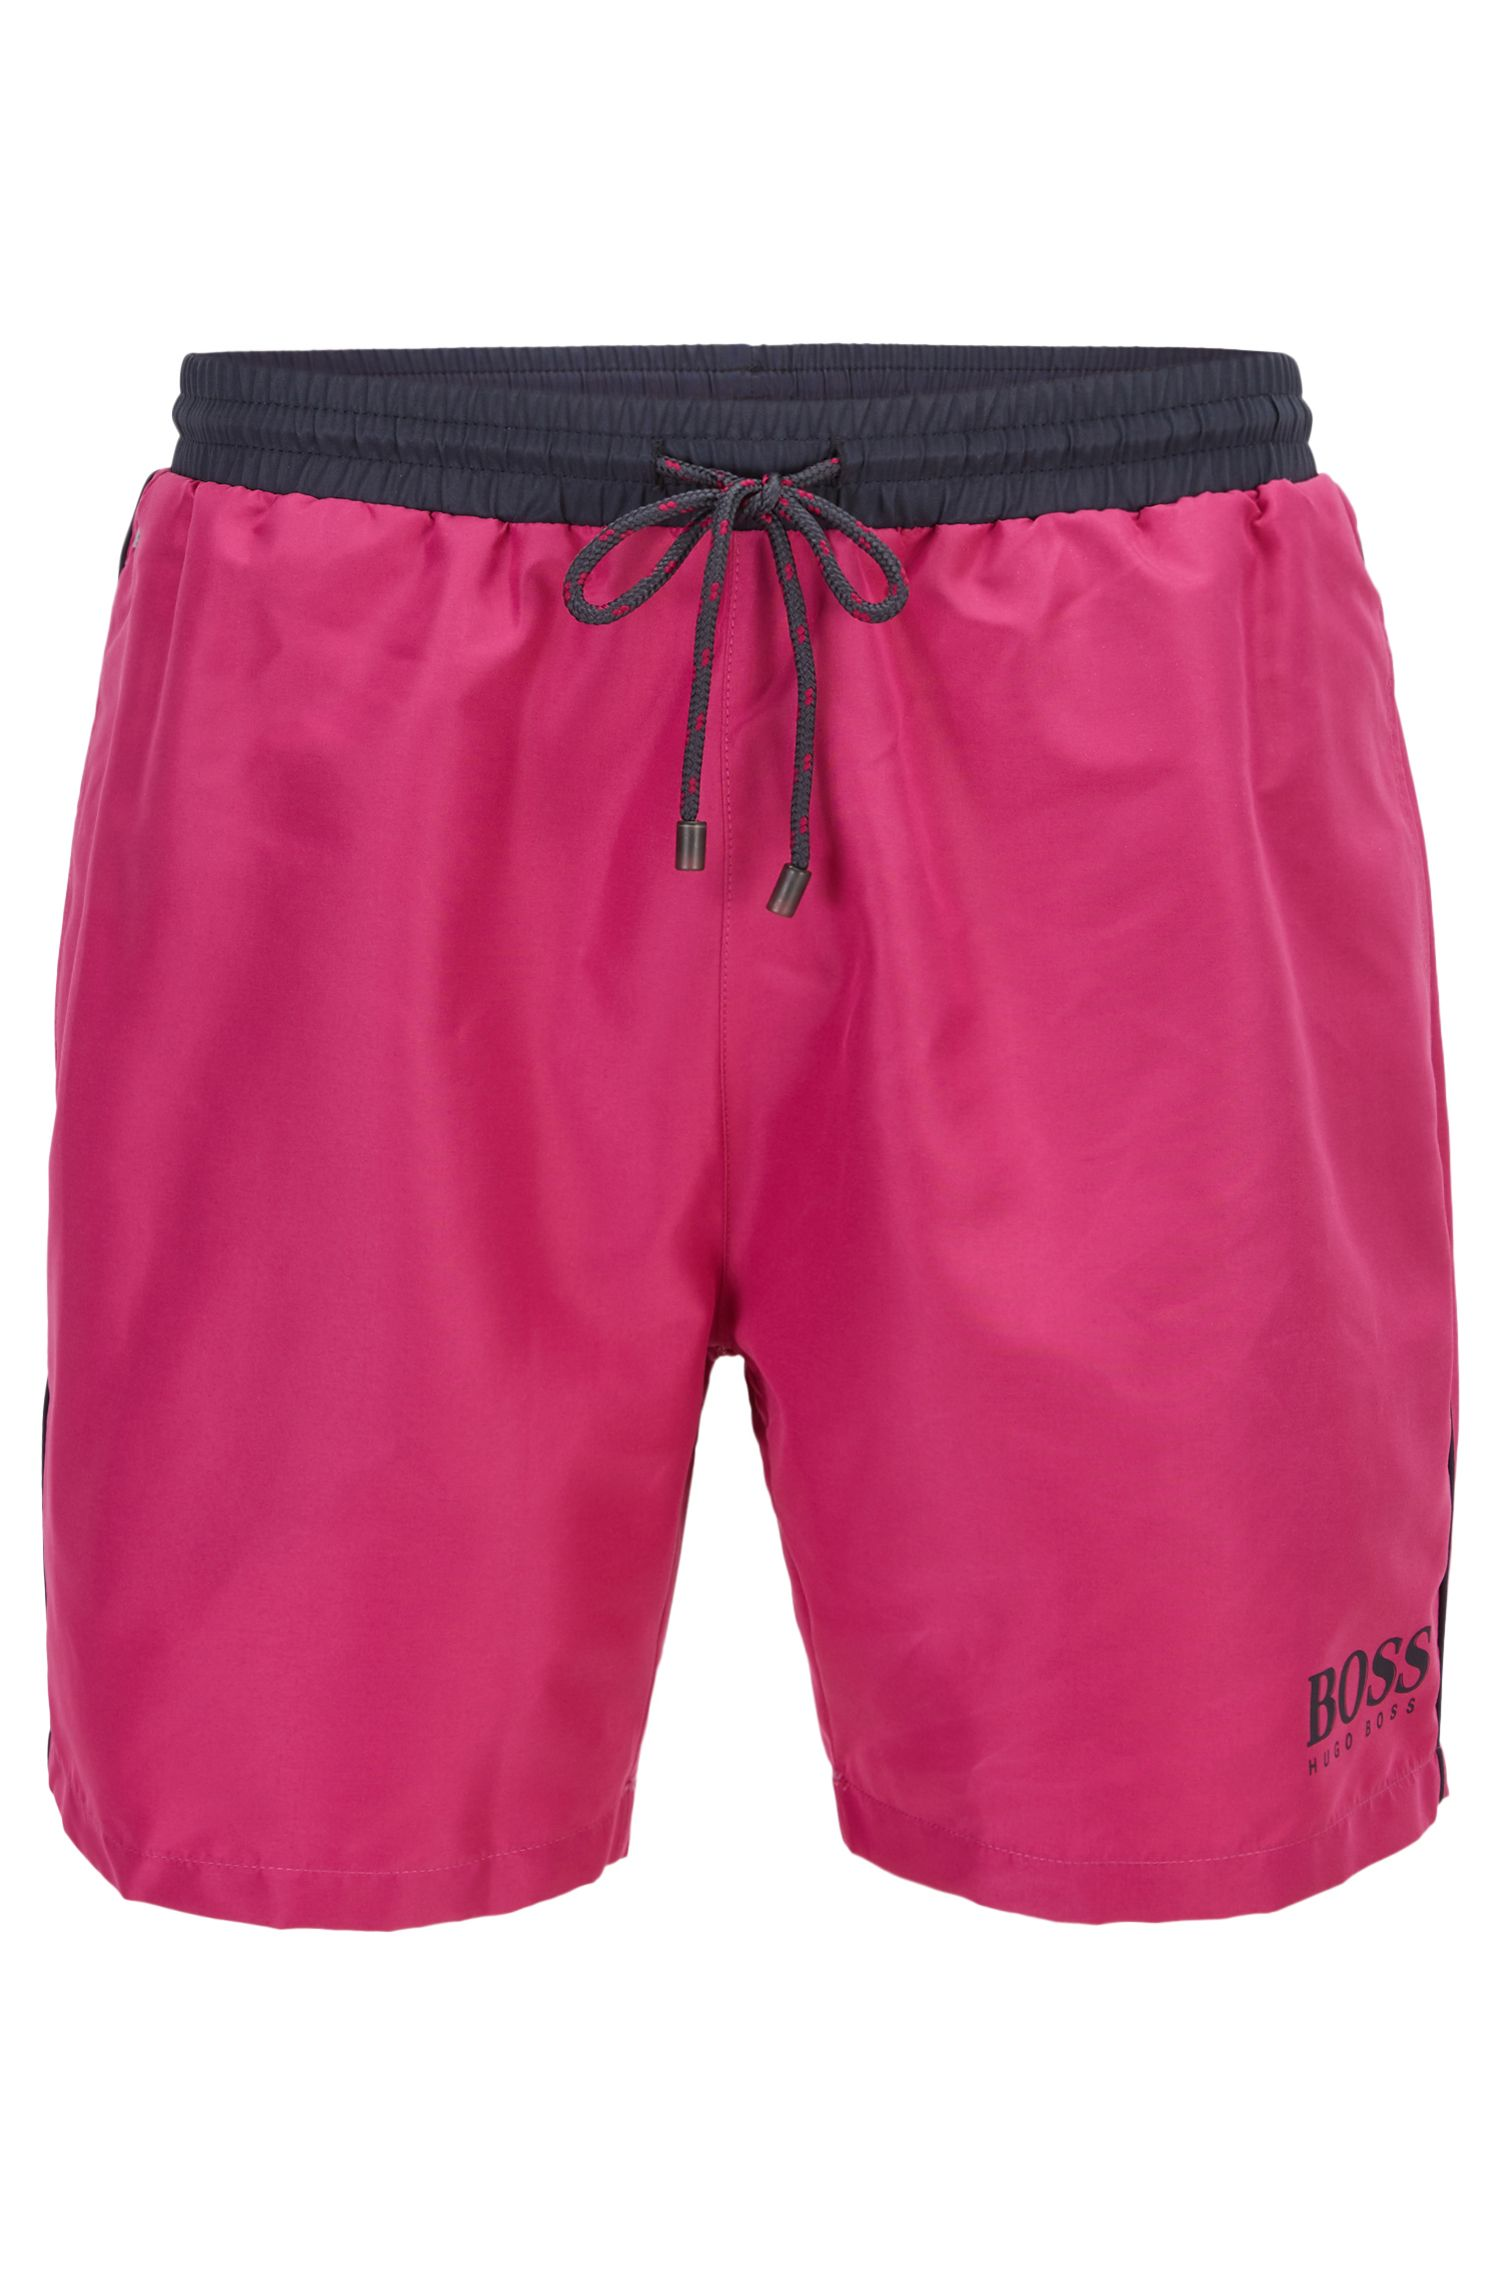 Swim shorts in technical fabric